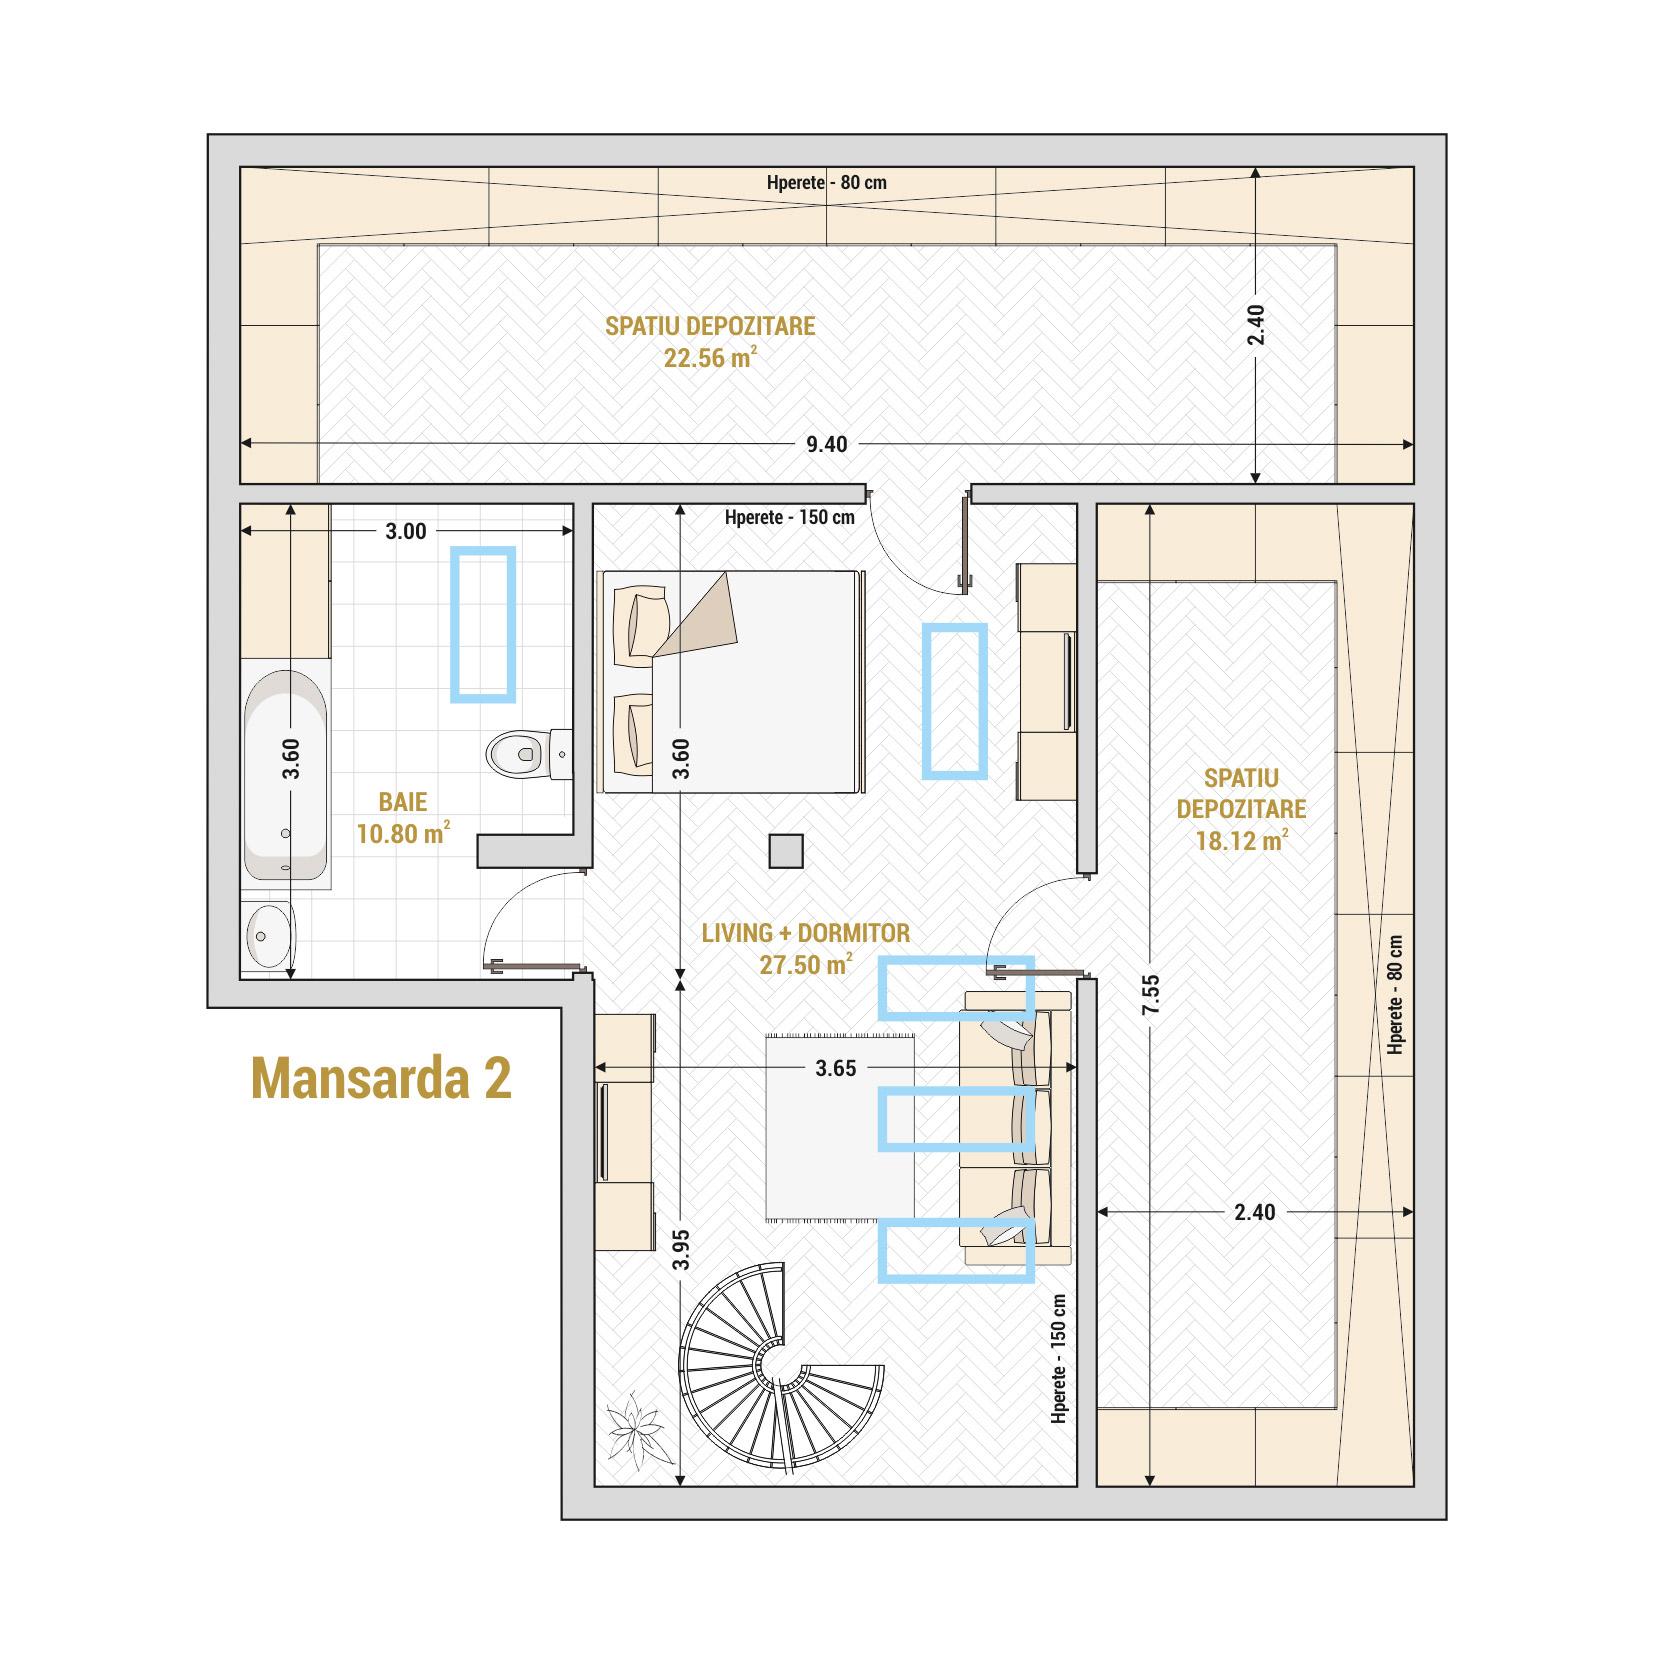 Duplex 4 camere de vanzare Bucuresti - Catedral Residence - Marriott, Piata Unirii, 13 Septembrie, Izvor - T2A - B